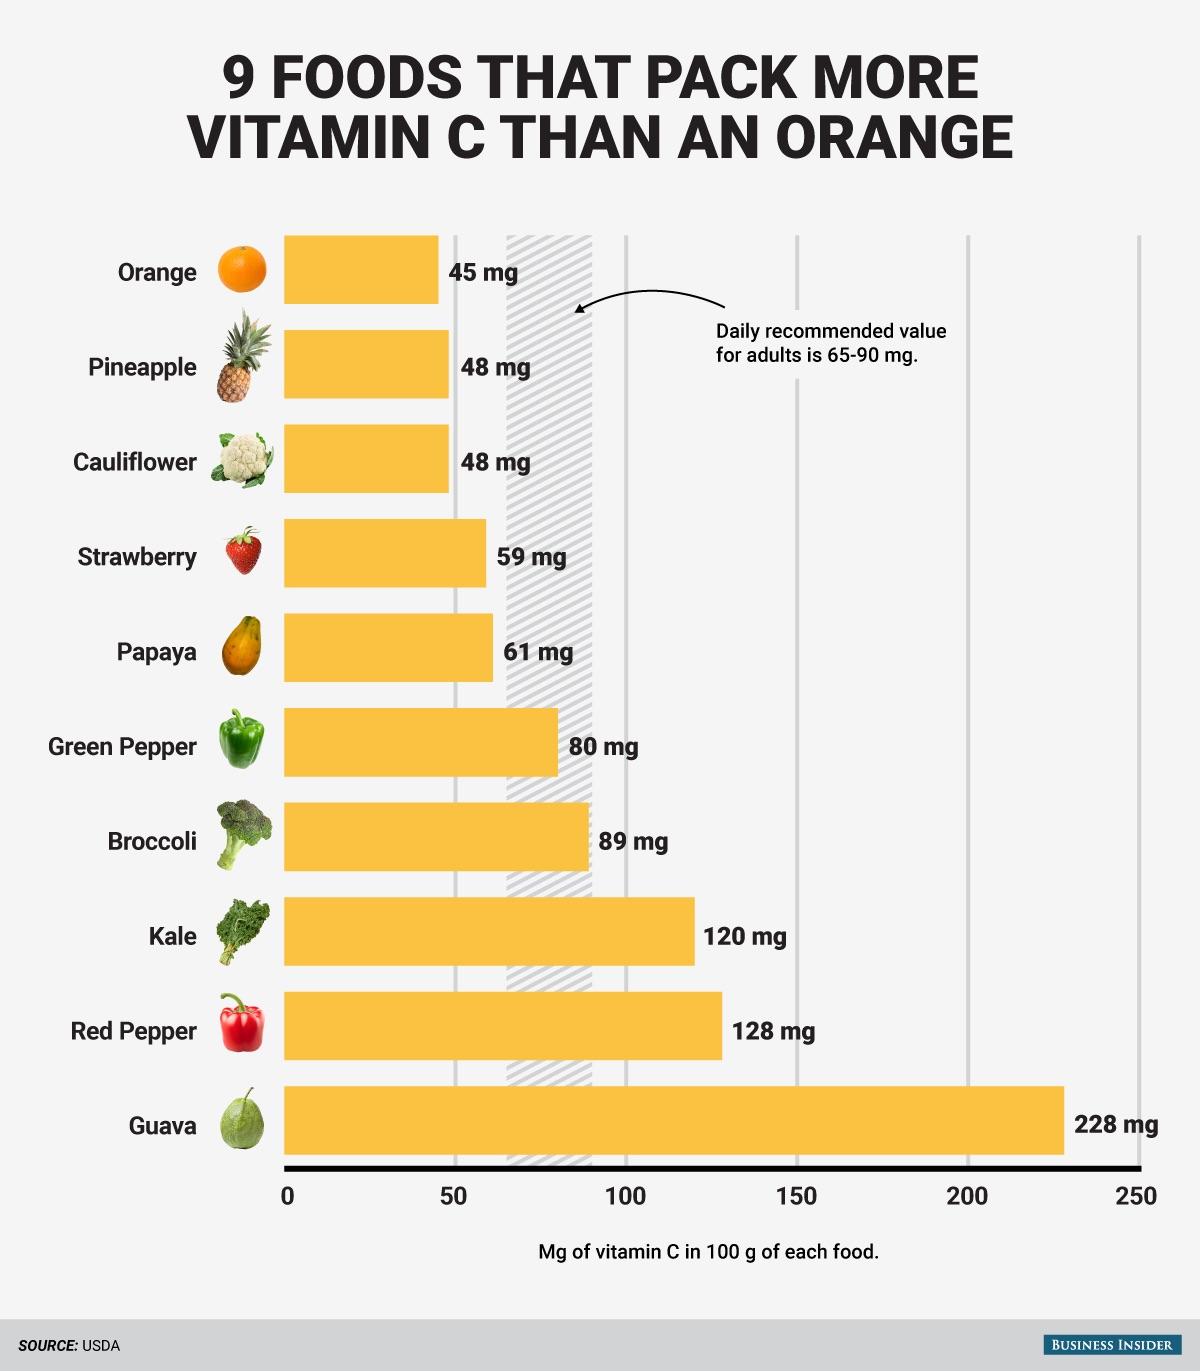 main-foods-that-pack-more-vitamin-c-than-an-orange.jpg